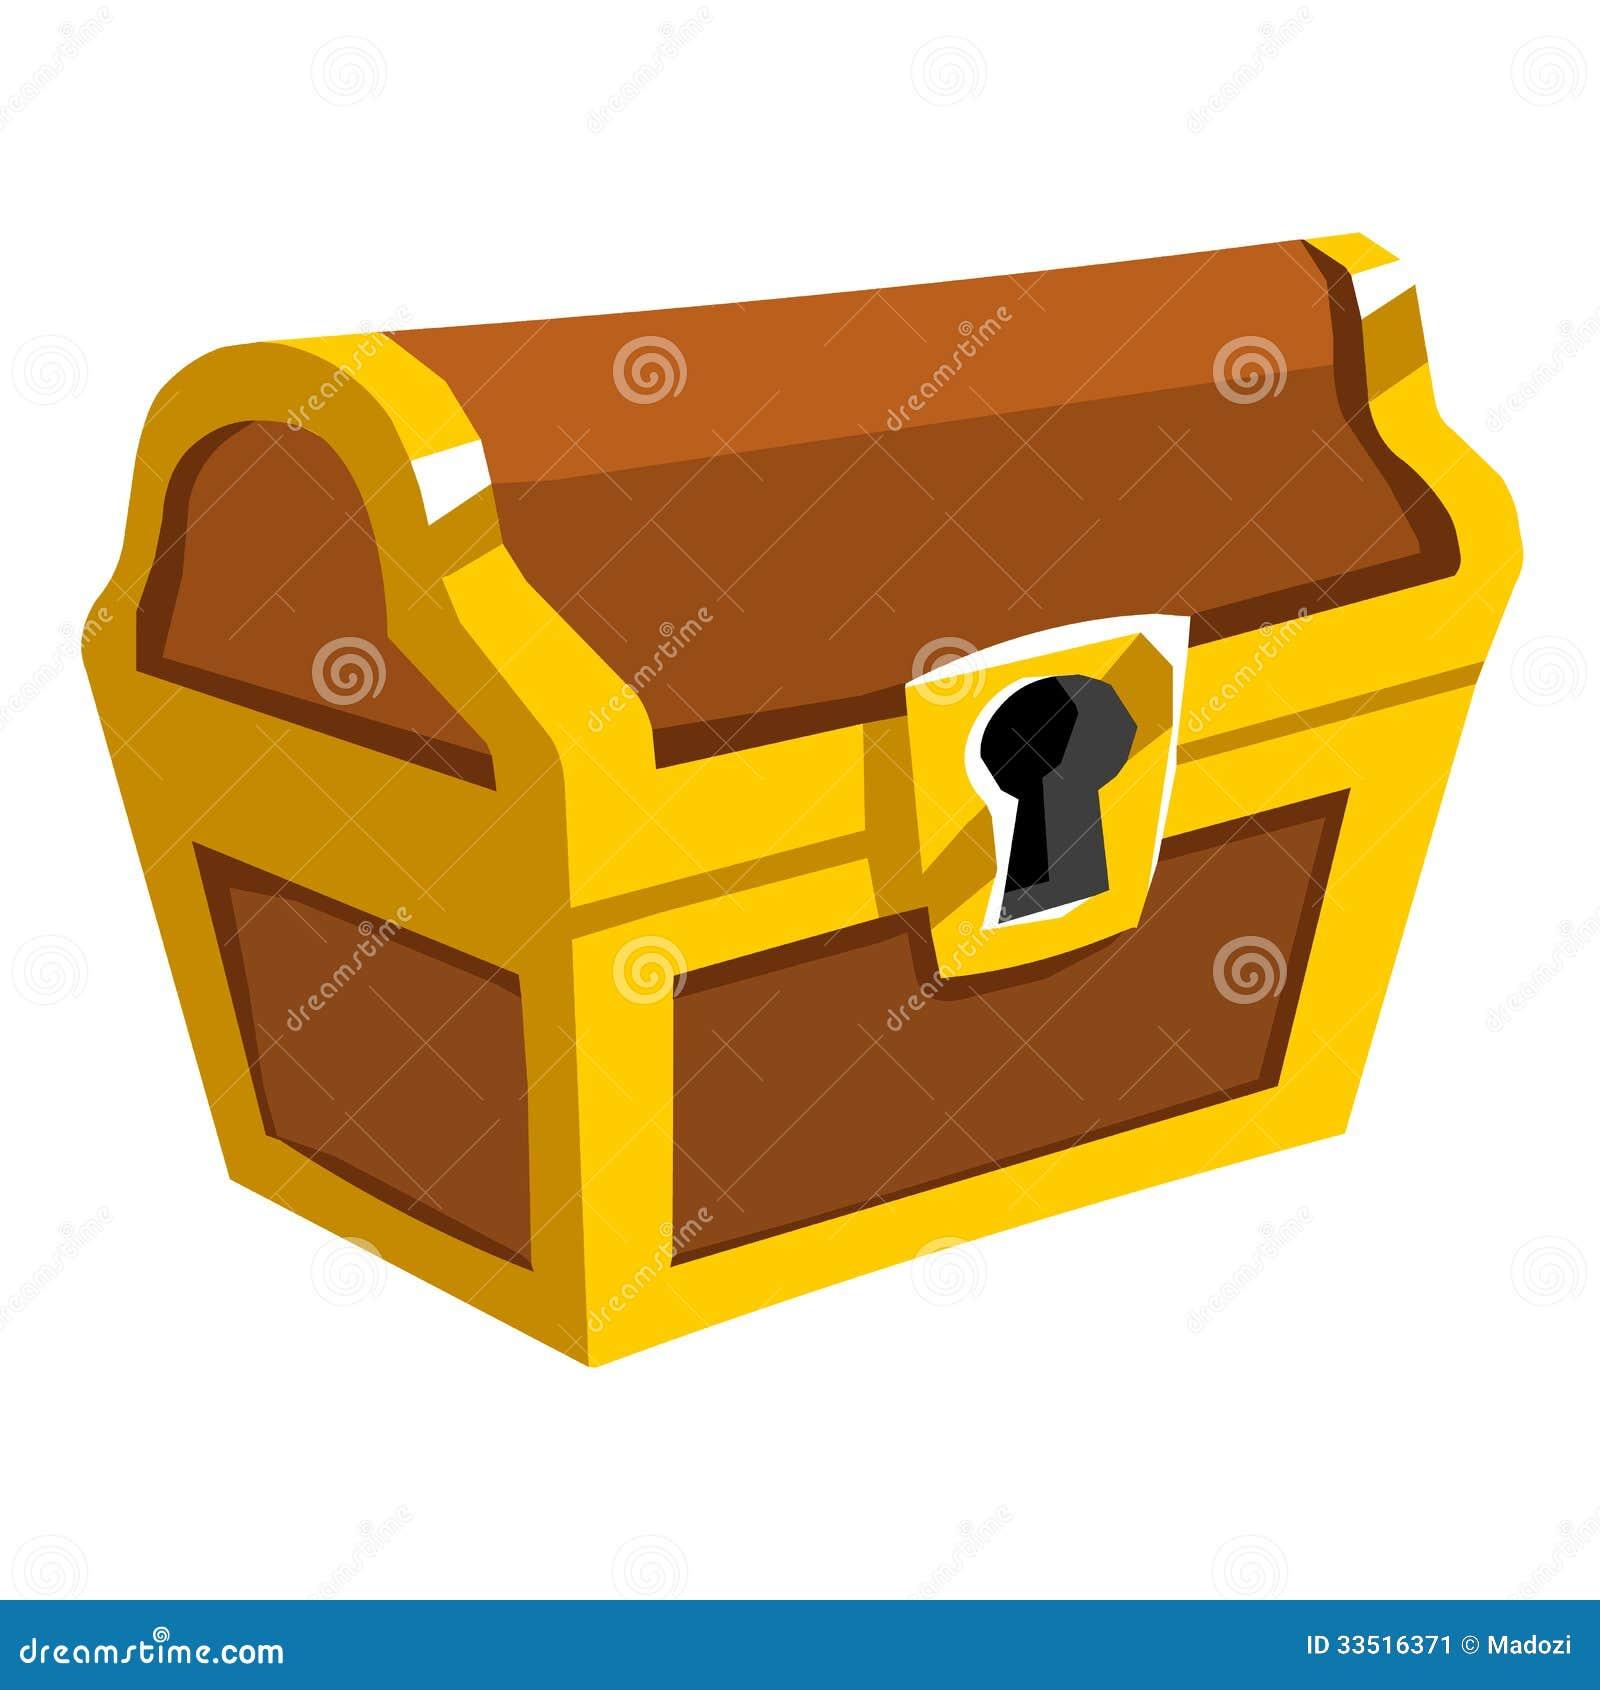 Treasure Chest Isolated Illustration Stock Image - Image: 33516371